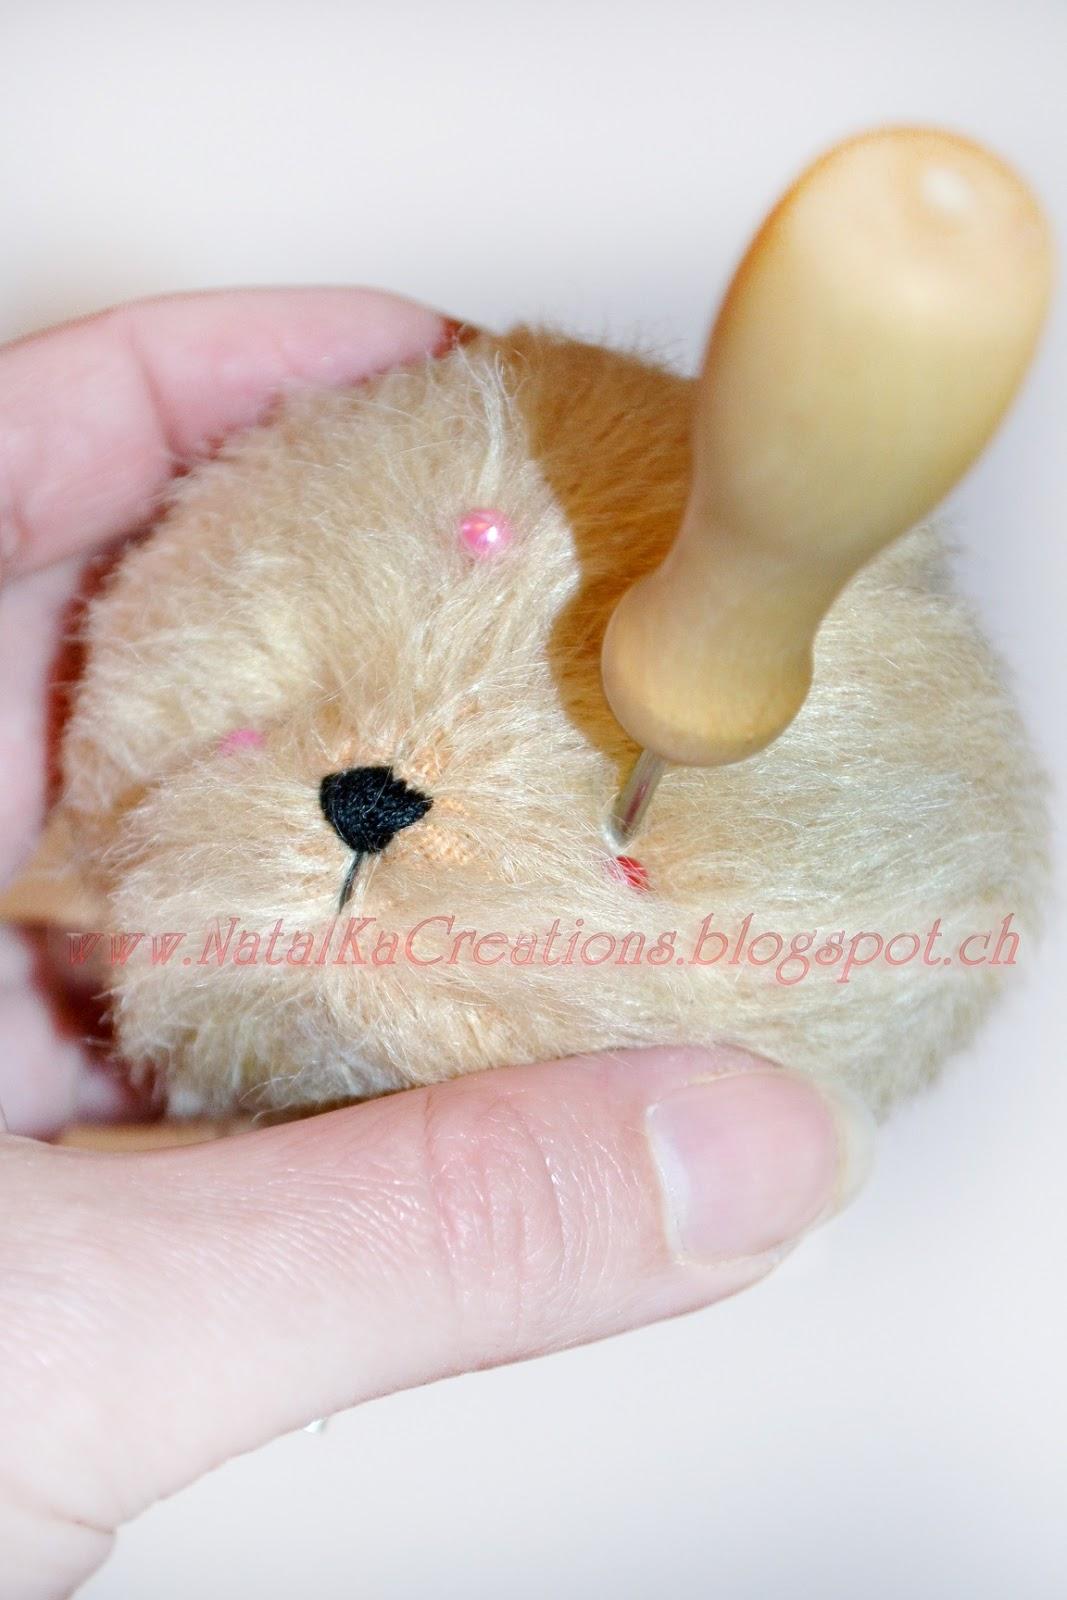 Онлан мастер-класс по пошиву мишки тедди, совместный пошив мишки тедди, как пошить мишку тедди,  шьем вместе мишку тедди с NatalKa Creations